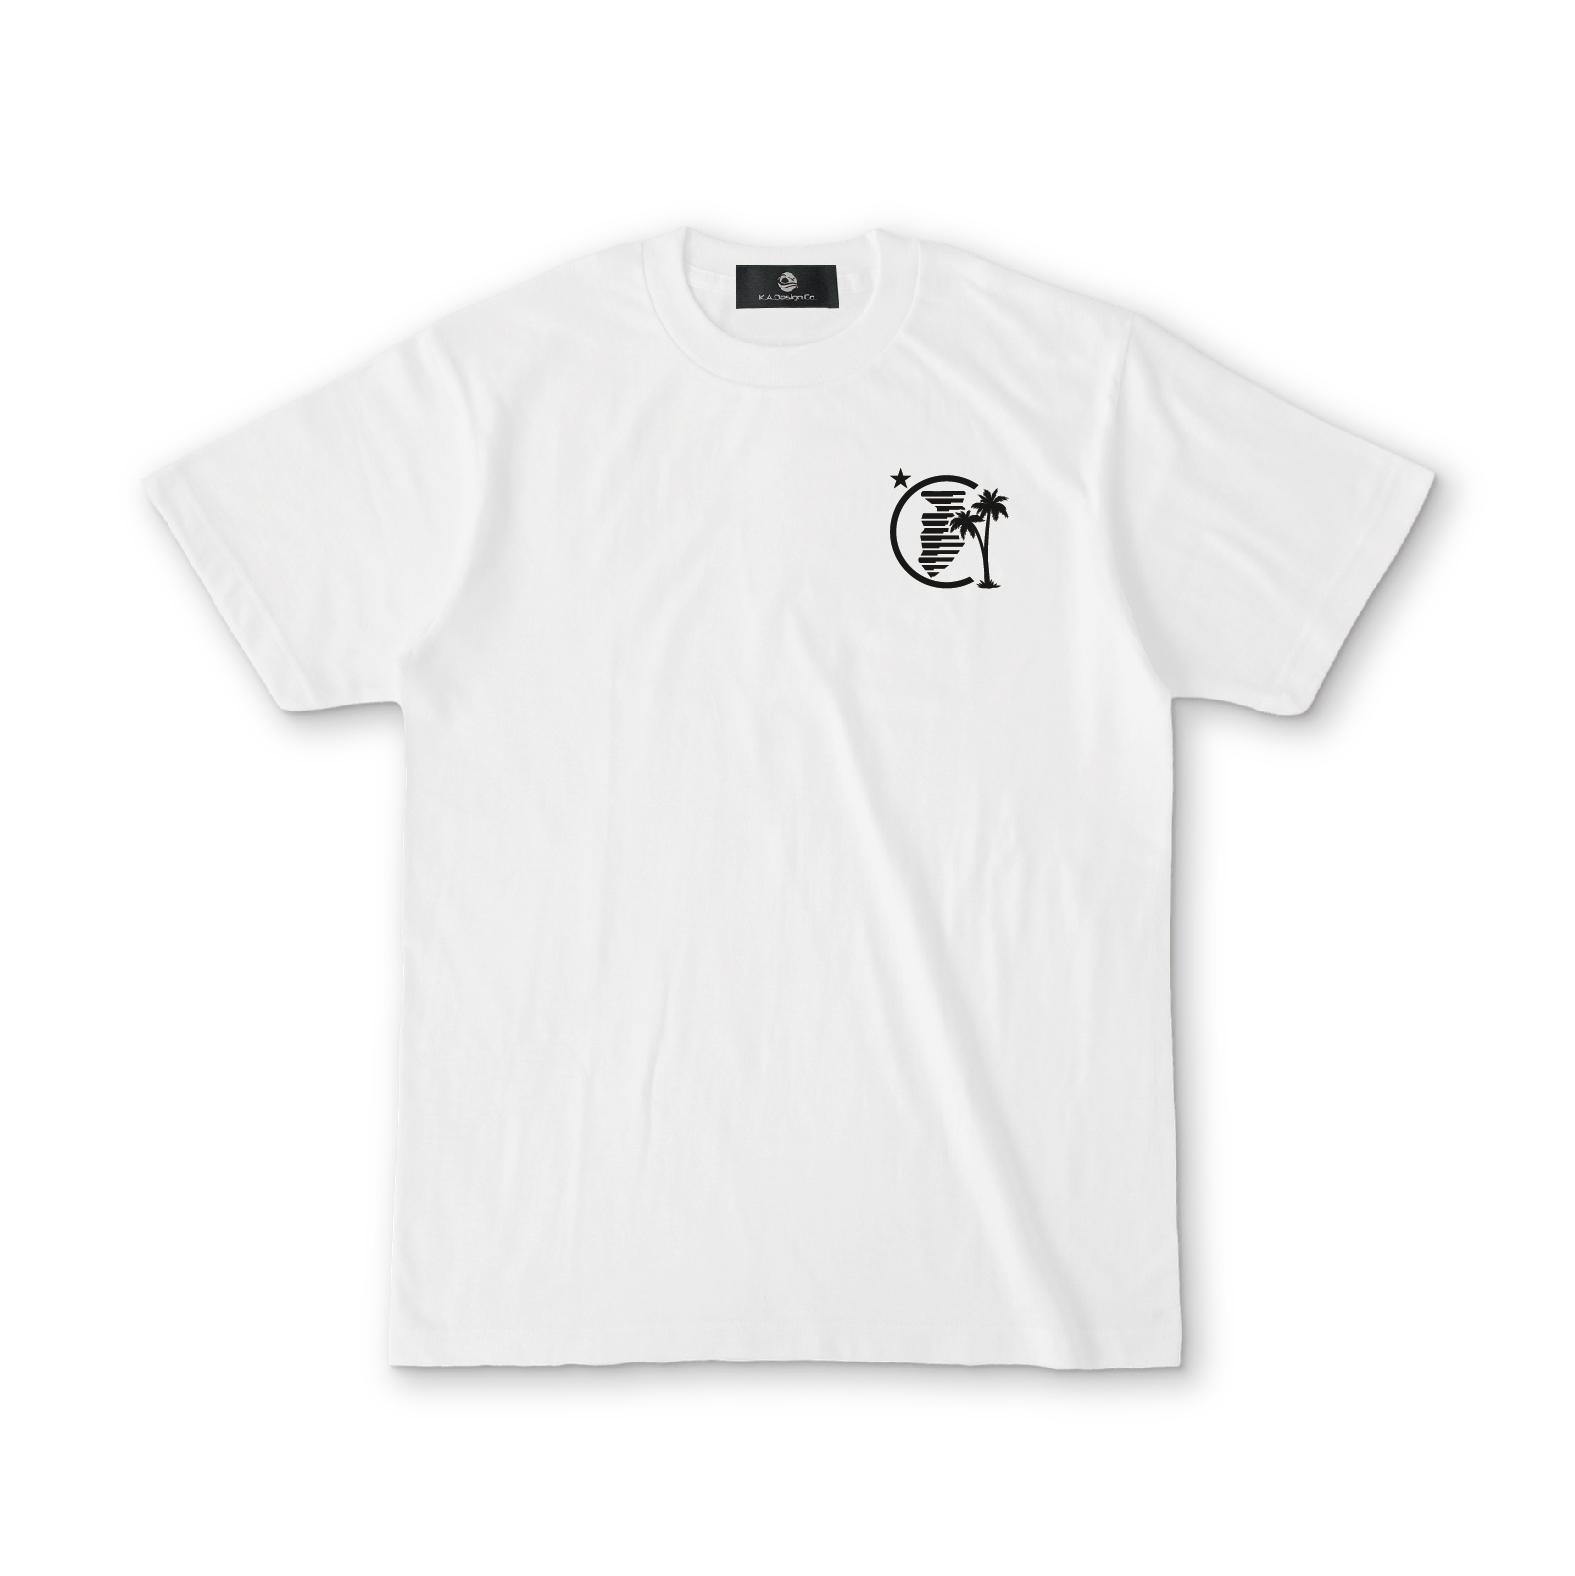 【即日発送】Izu GEO Typography Tee(Black)